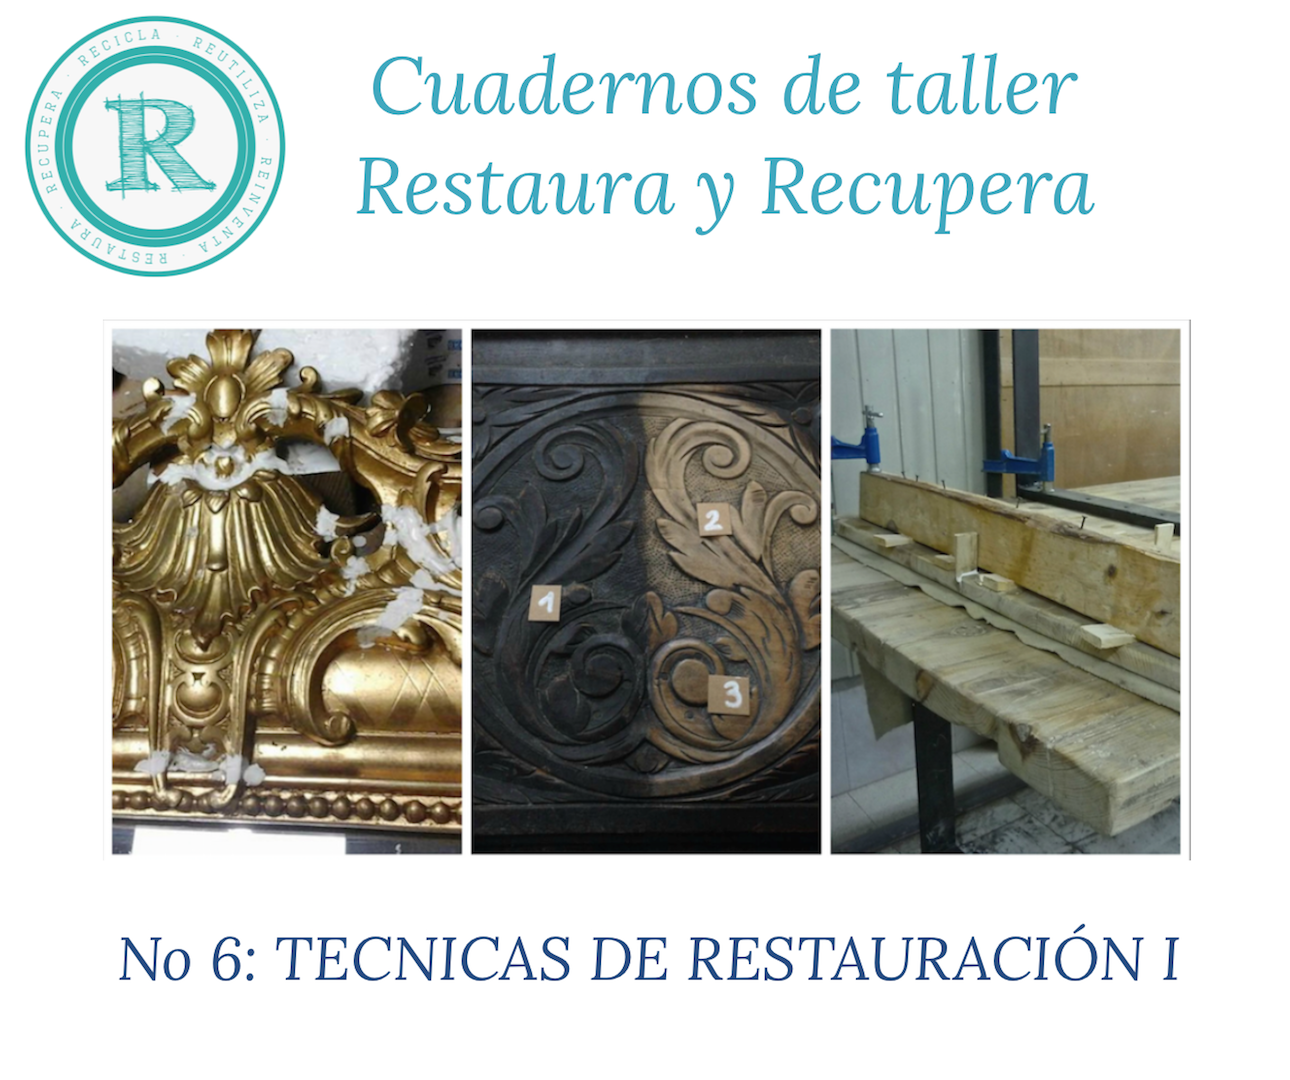 Taller n 6 t cnicas de restauraci n i restaura y recupera - Tecnicas de restauracion de muebles ...